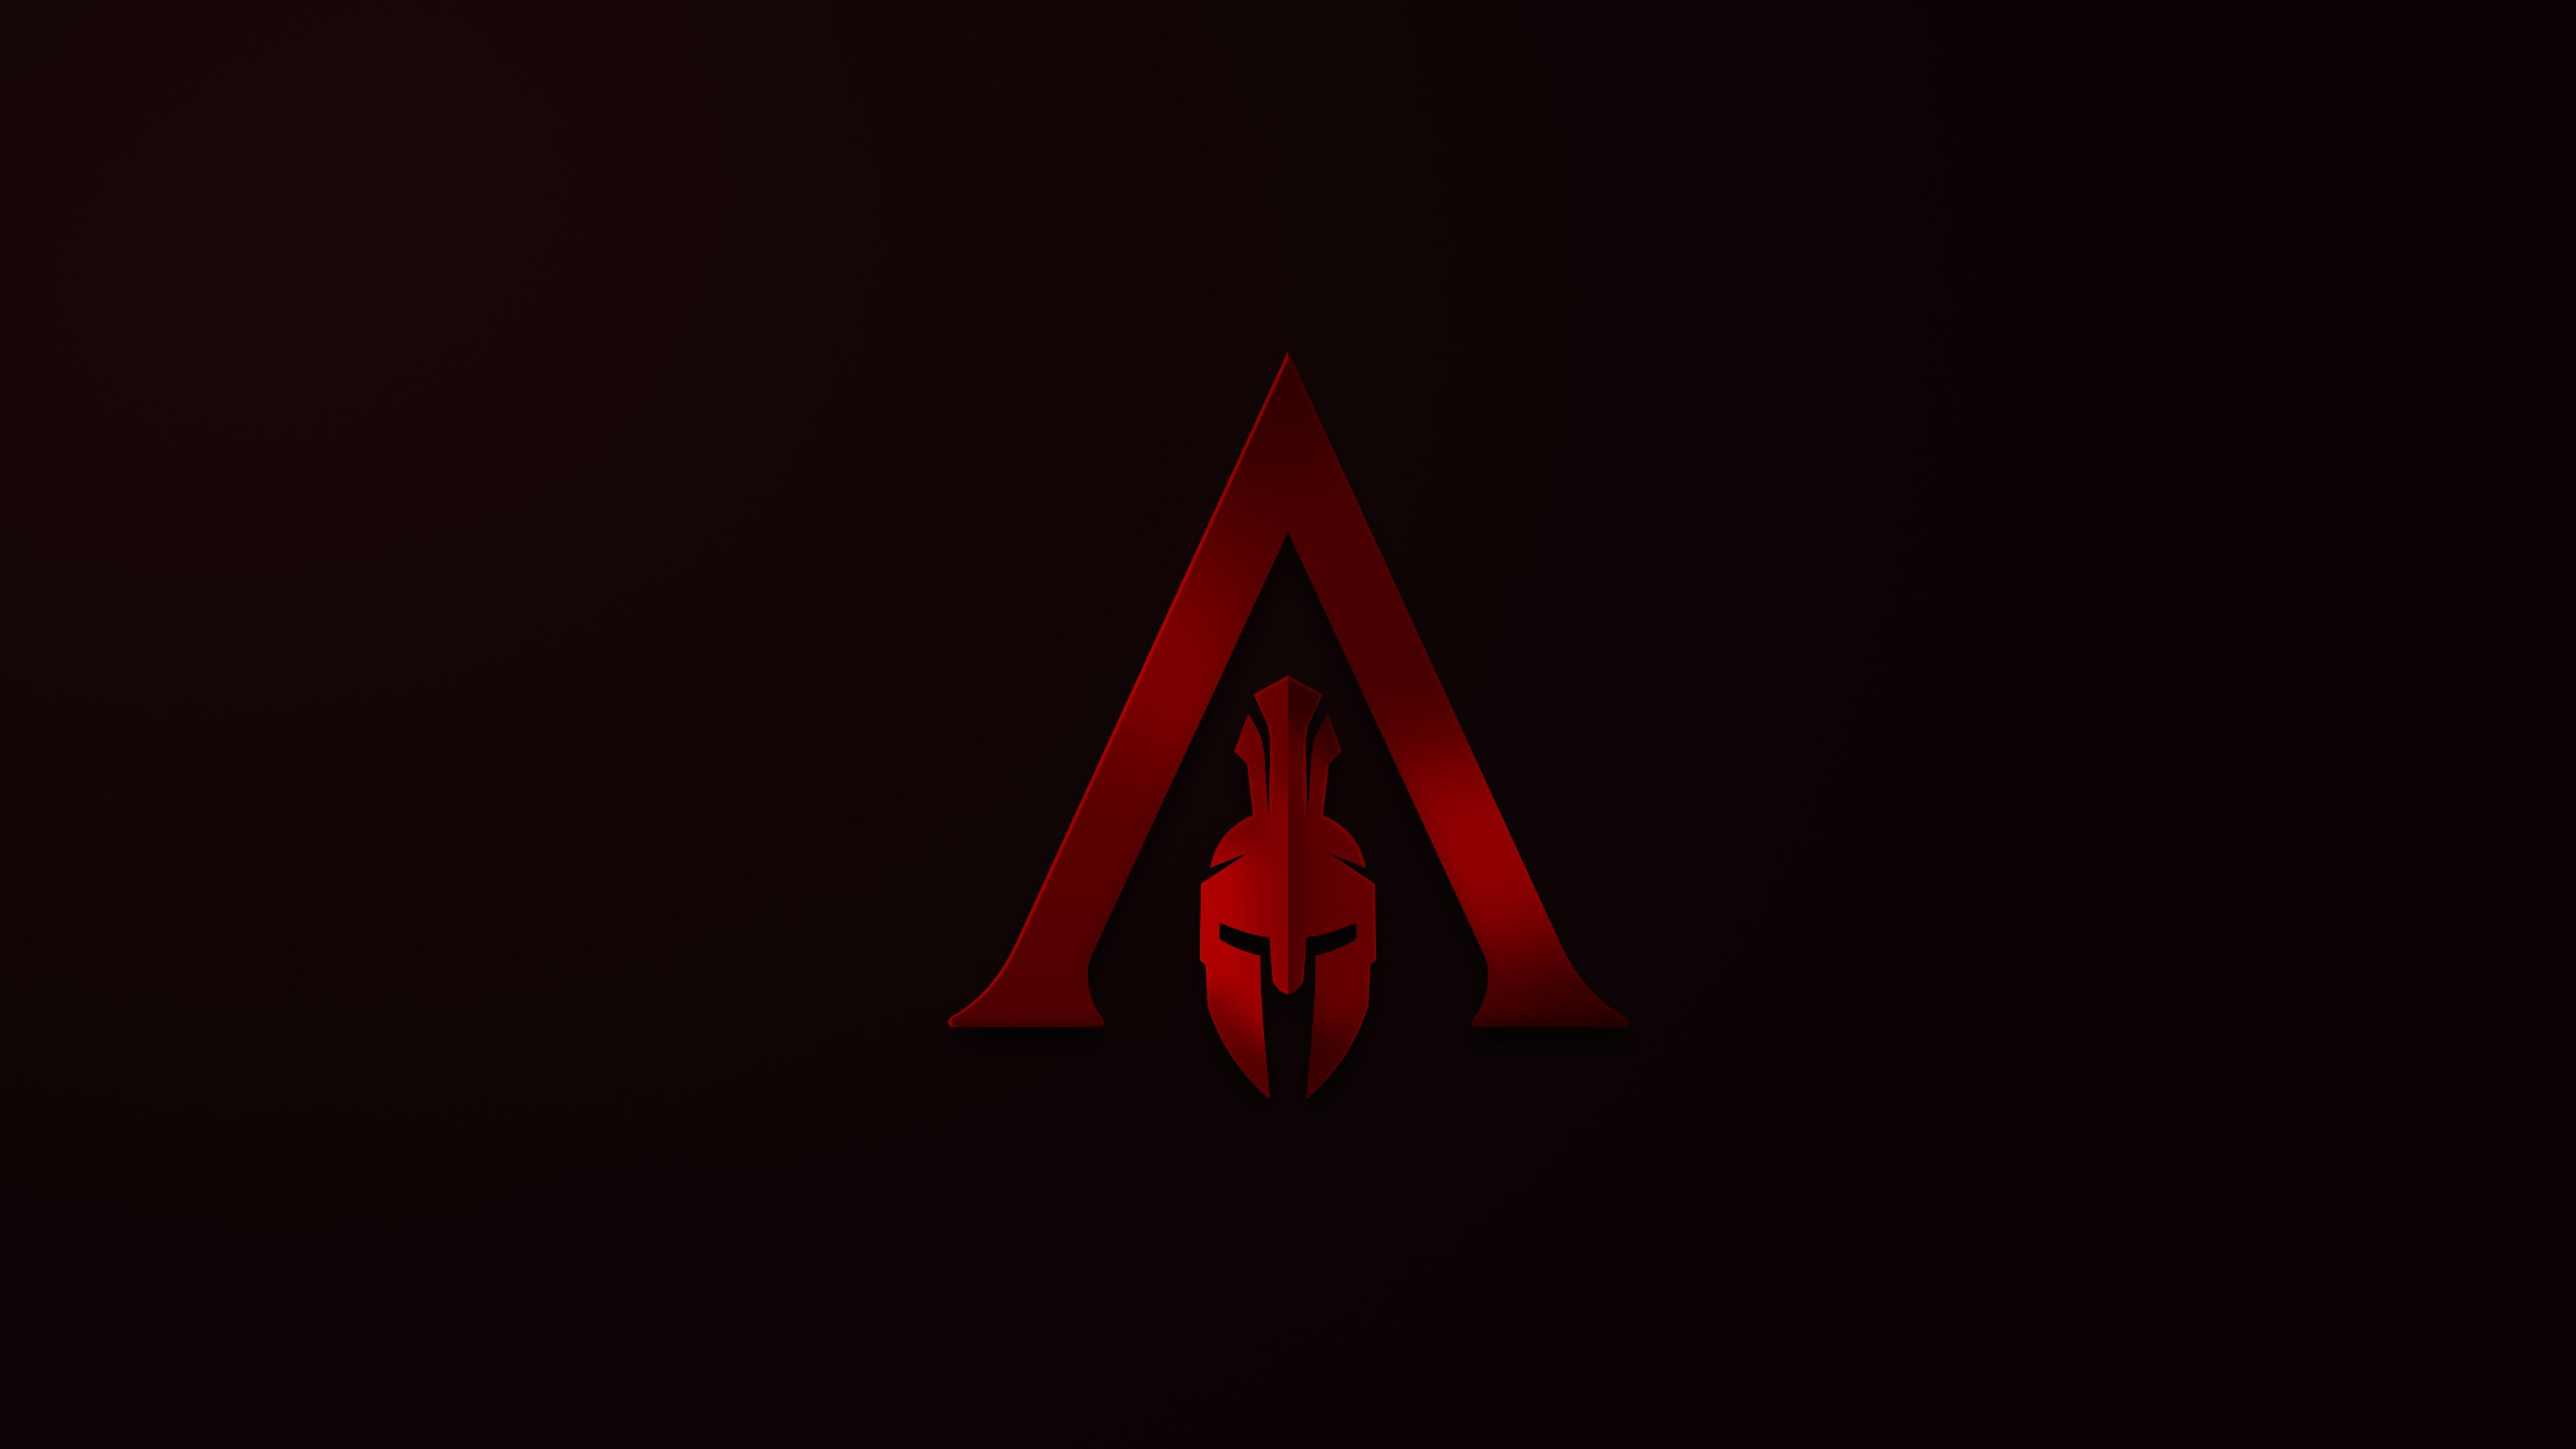 Assassins Creed Odyssey Minimalism Logo 4k, HD Games, 4k